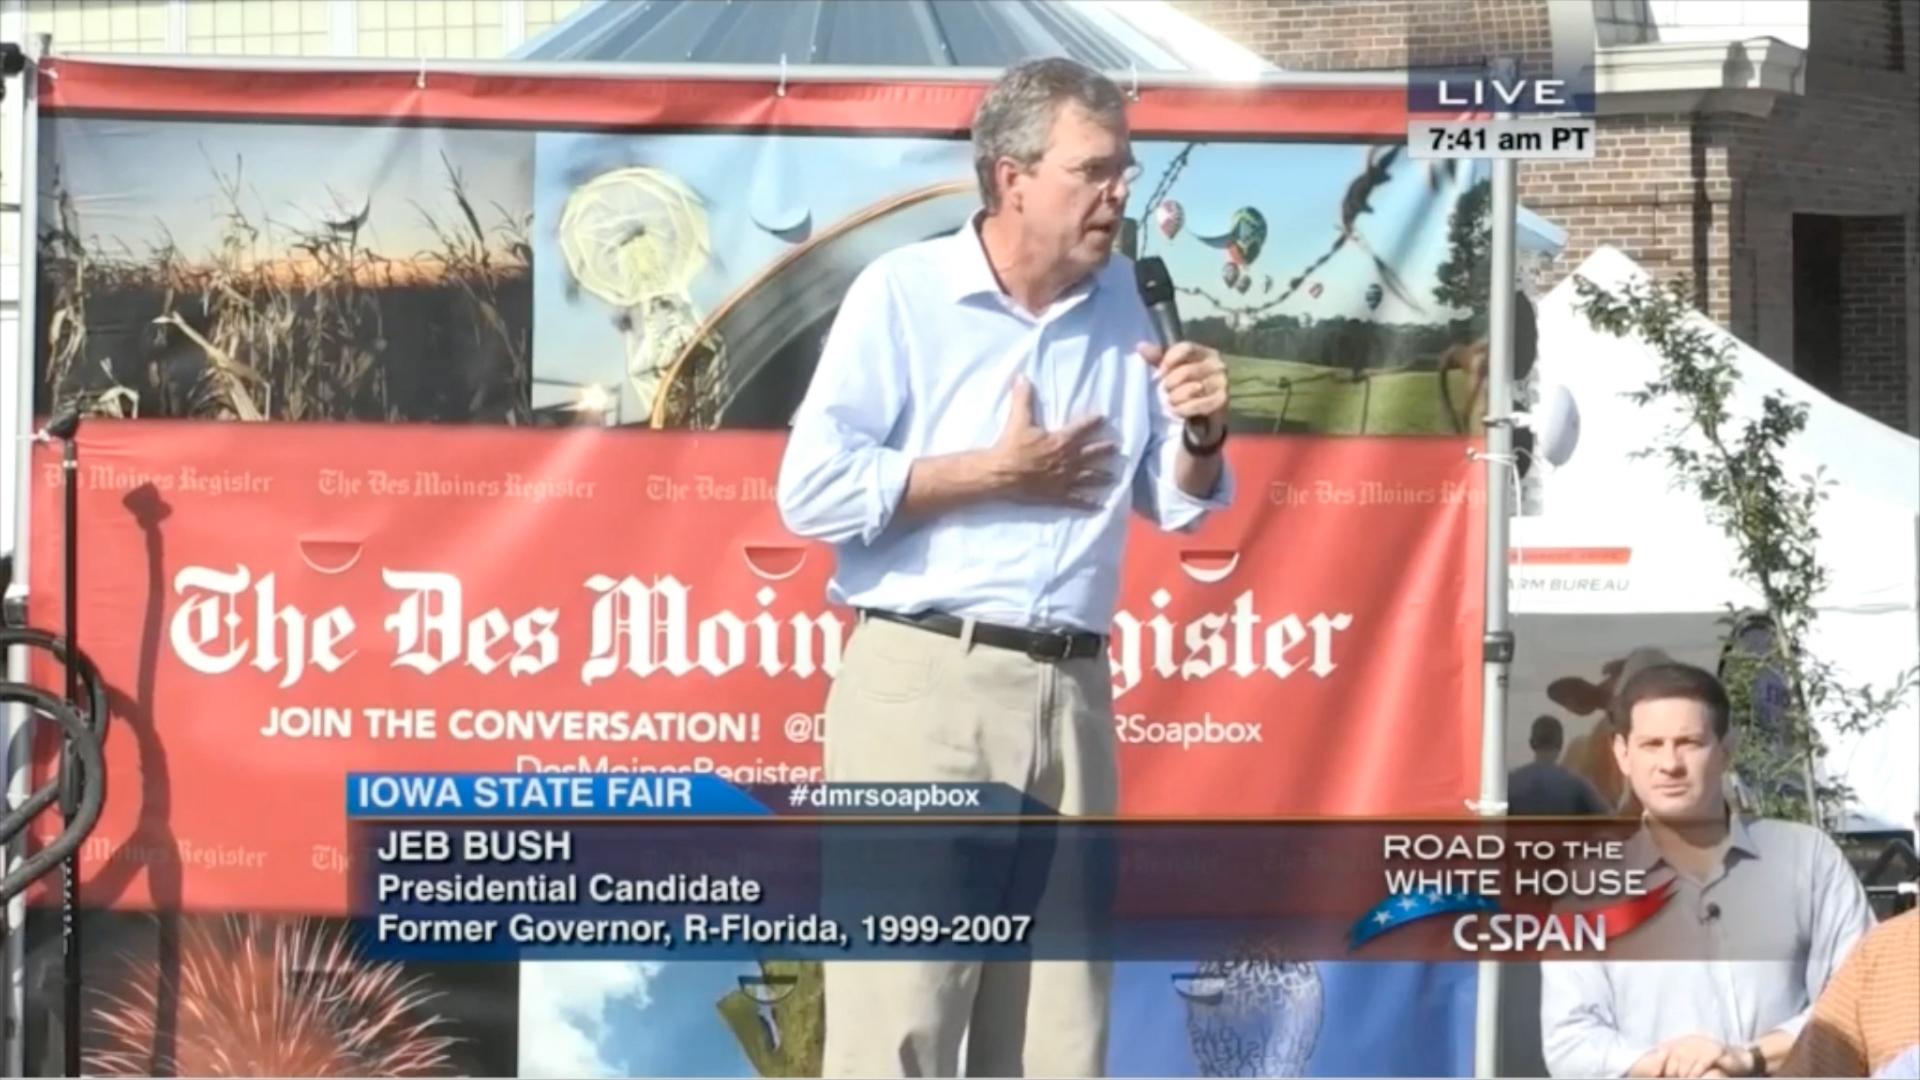 Family history hounds Jeb Bush on campaign trail